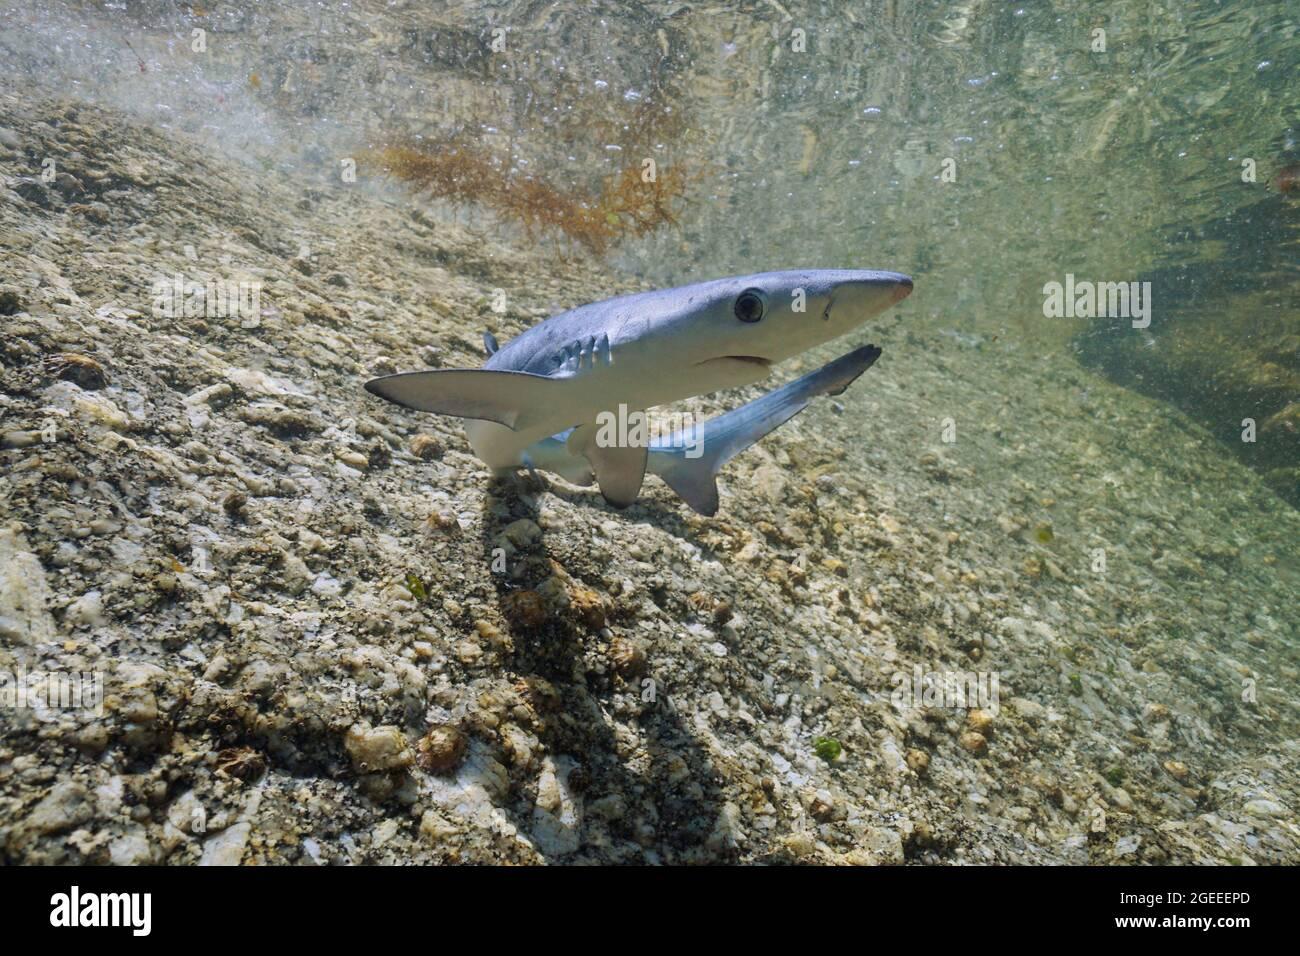 Juvenile blue shark, Prionace glauca, underwater in shallow water, Atlantic ocean, Galicia, Spain Stock Photo